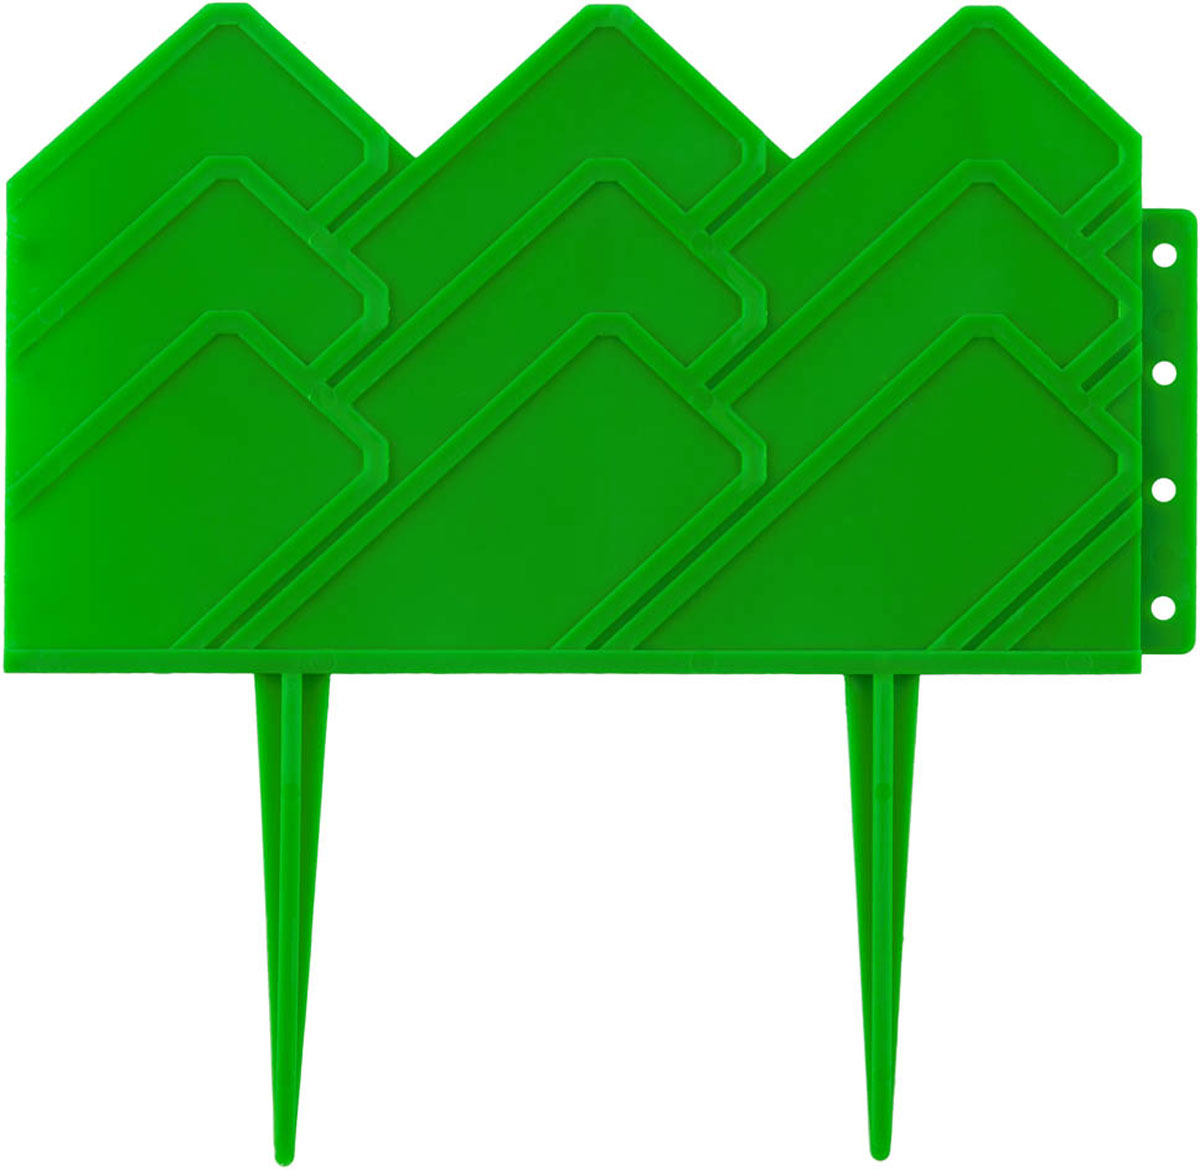 Бордюр декоративный Grinda, для клумб, цвет: зеленый, 14 х 310 см бордюр декоративный летний сад grinda 422225 y